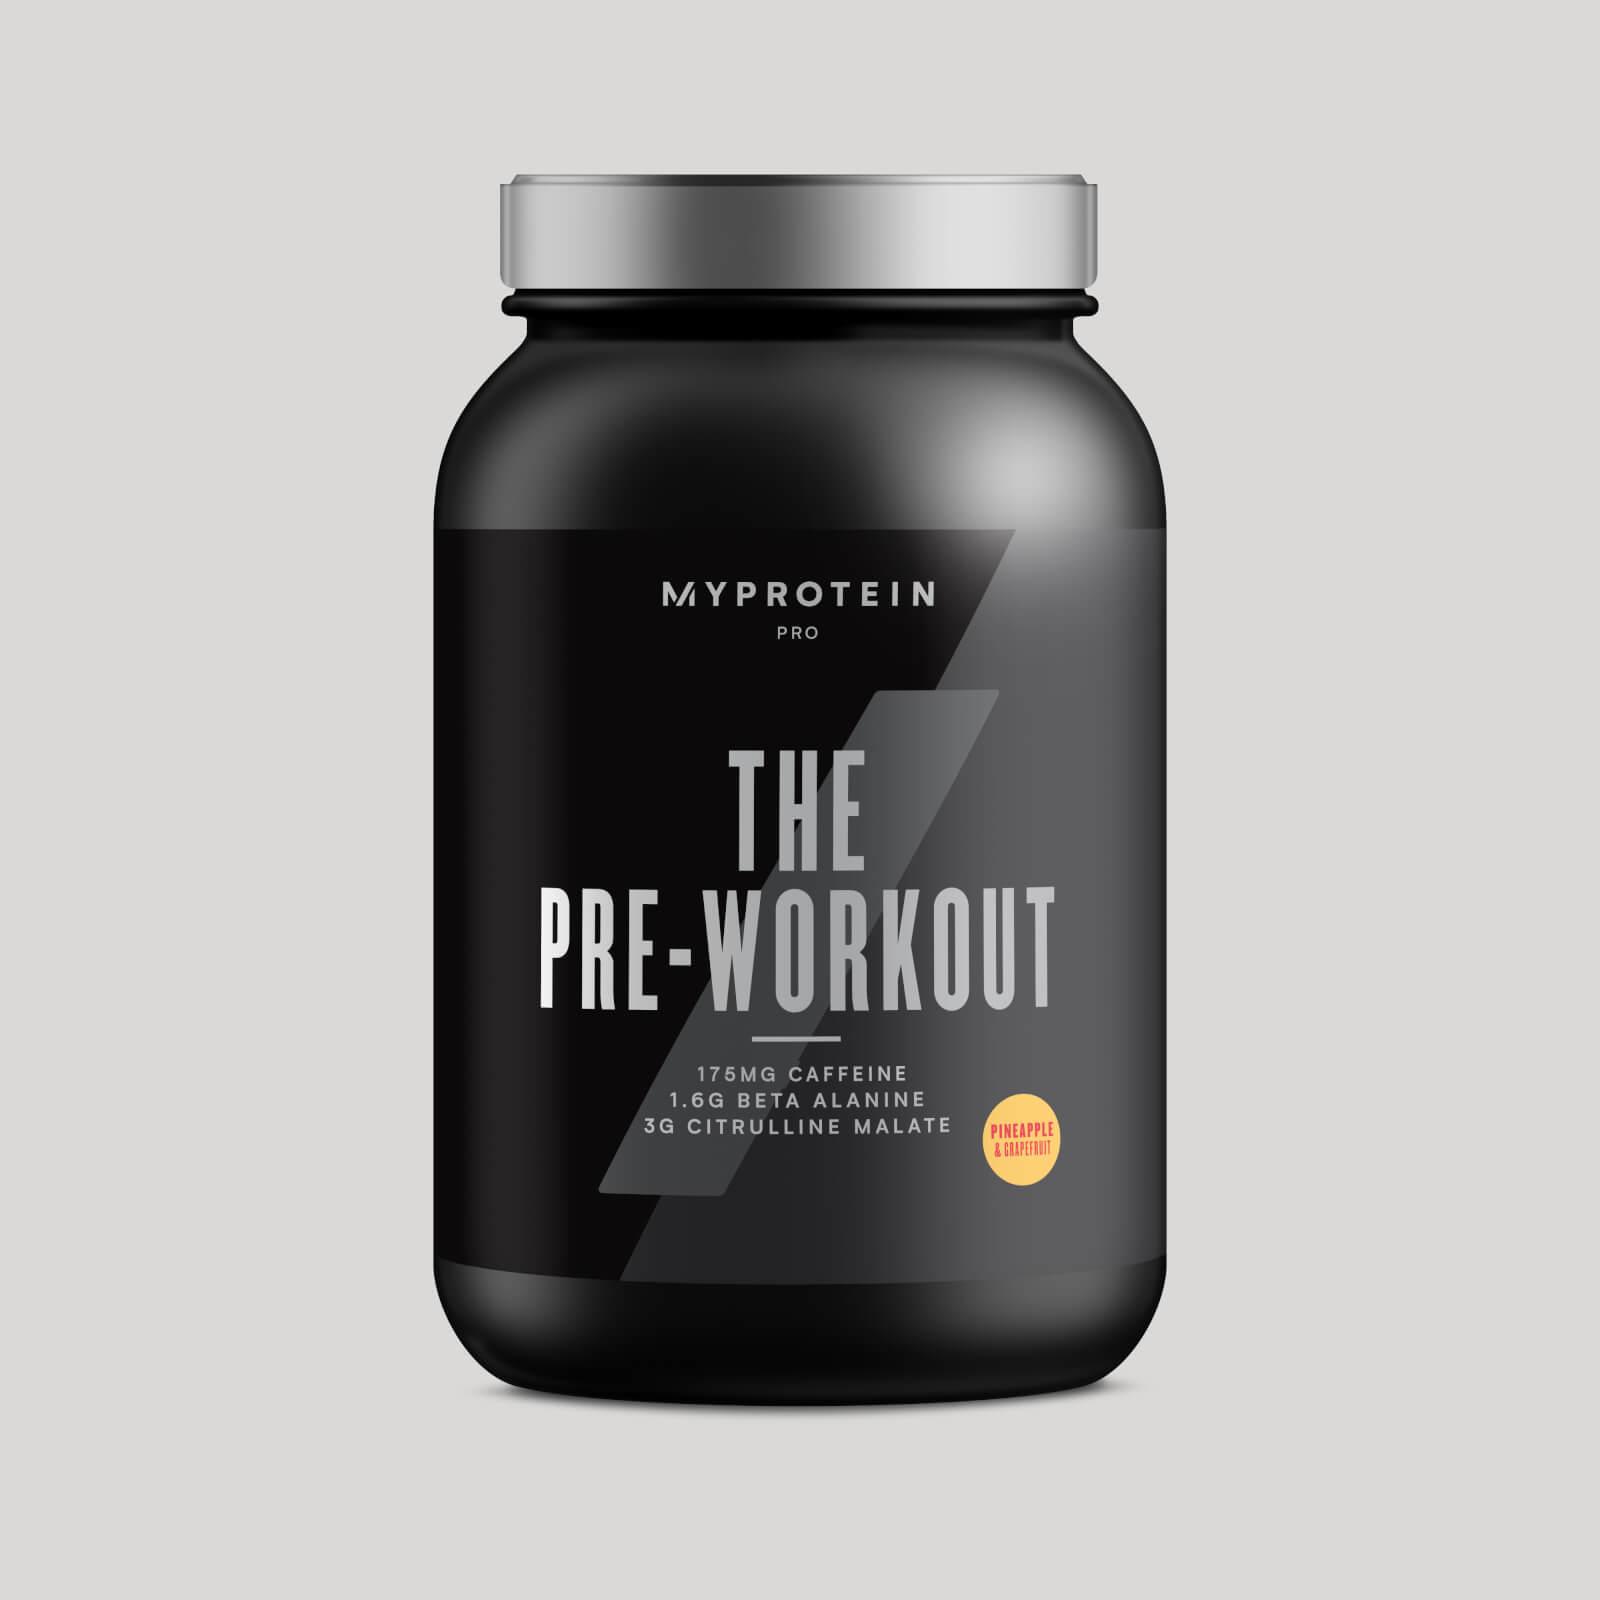 Myprotein Mypre™ 2.0 - 30servings - Pineapple Grapefruit